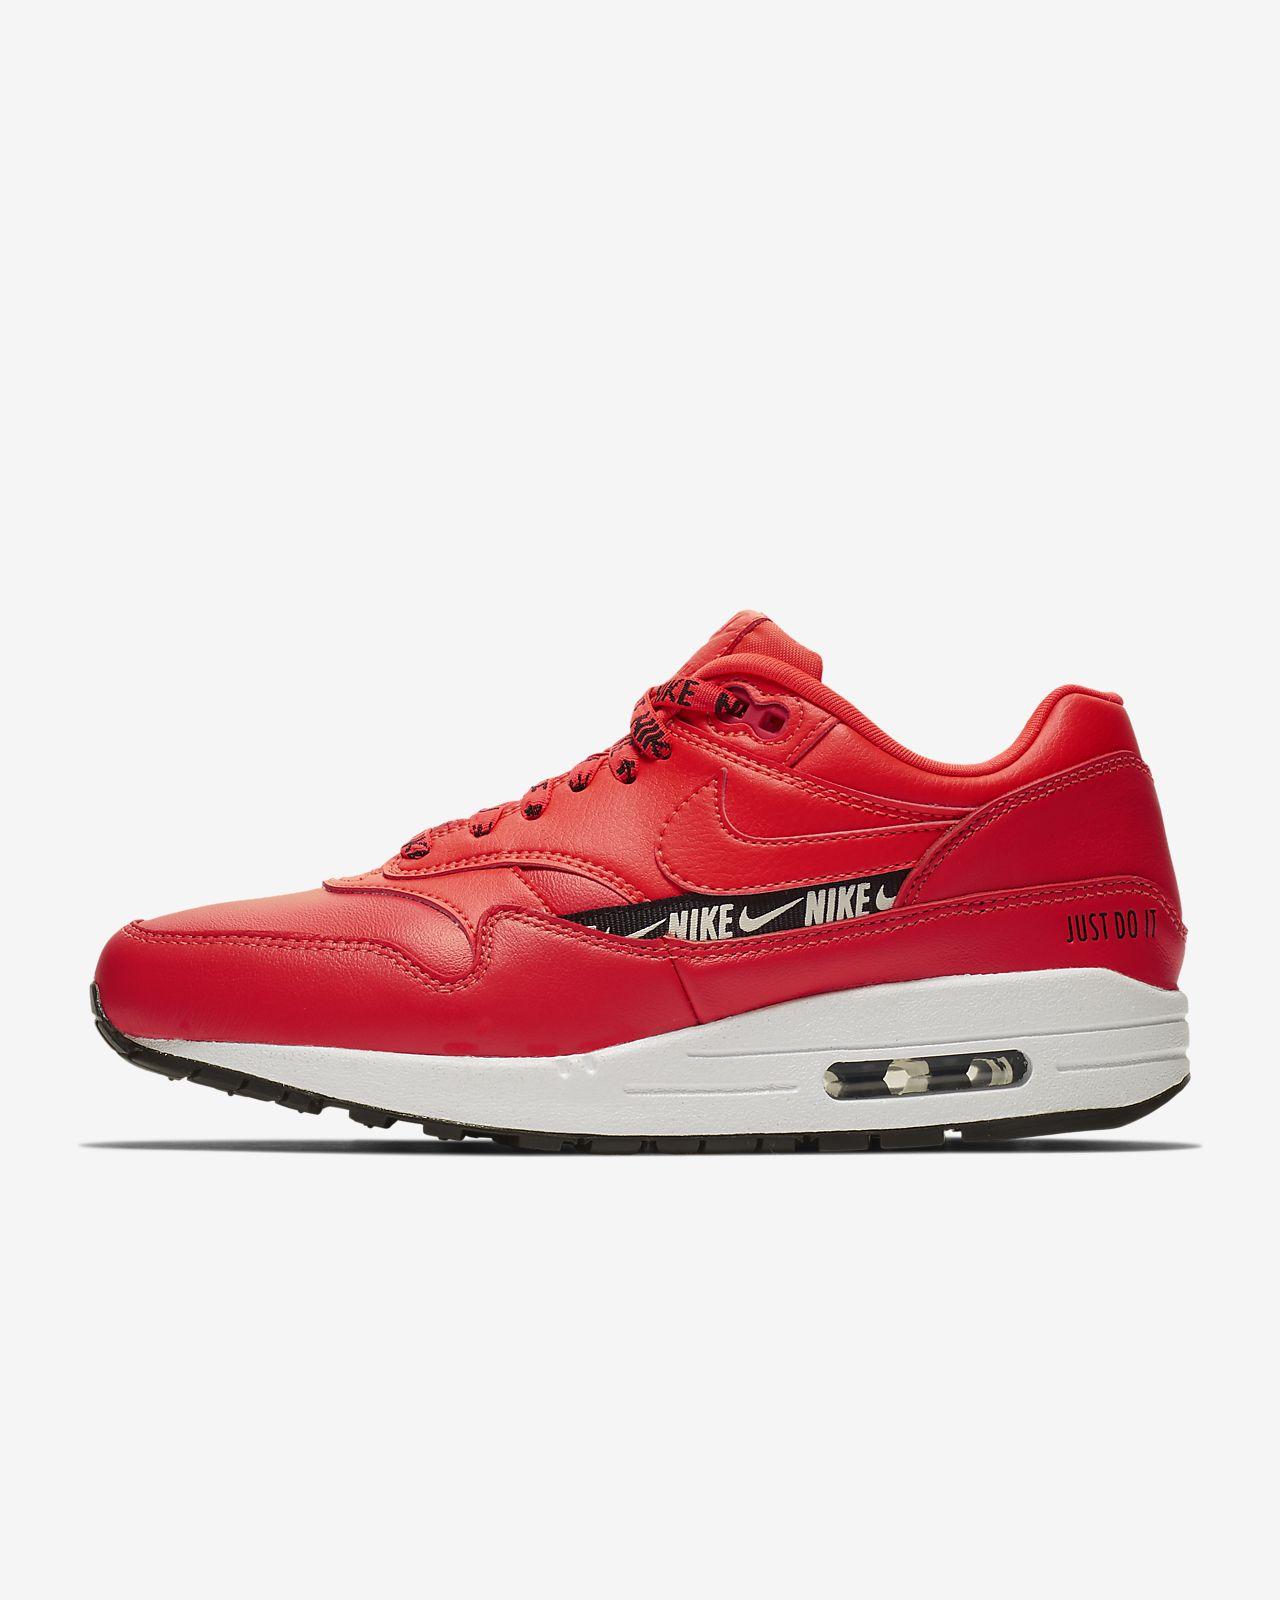 super popular 37dbf d4d5f ... Nike Air Max 1 SE Women s Shoe